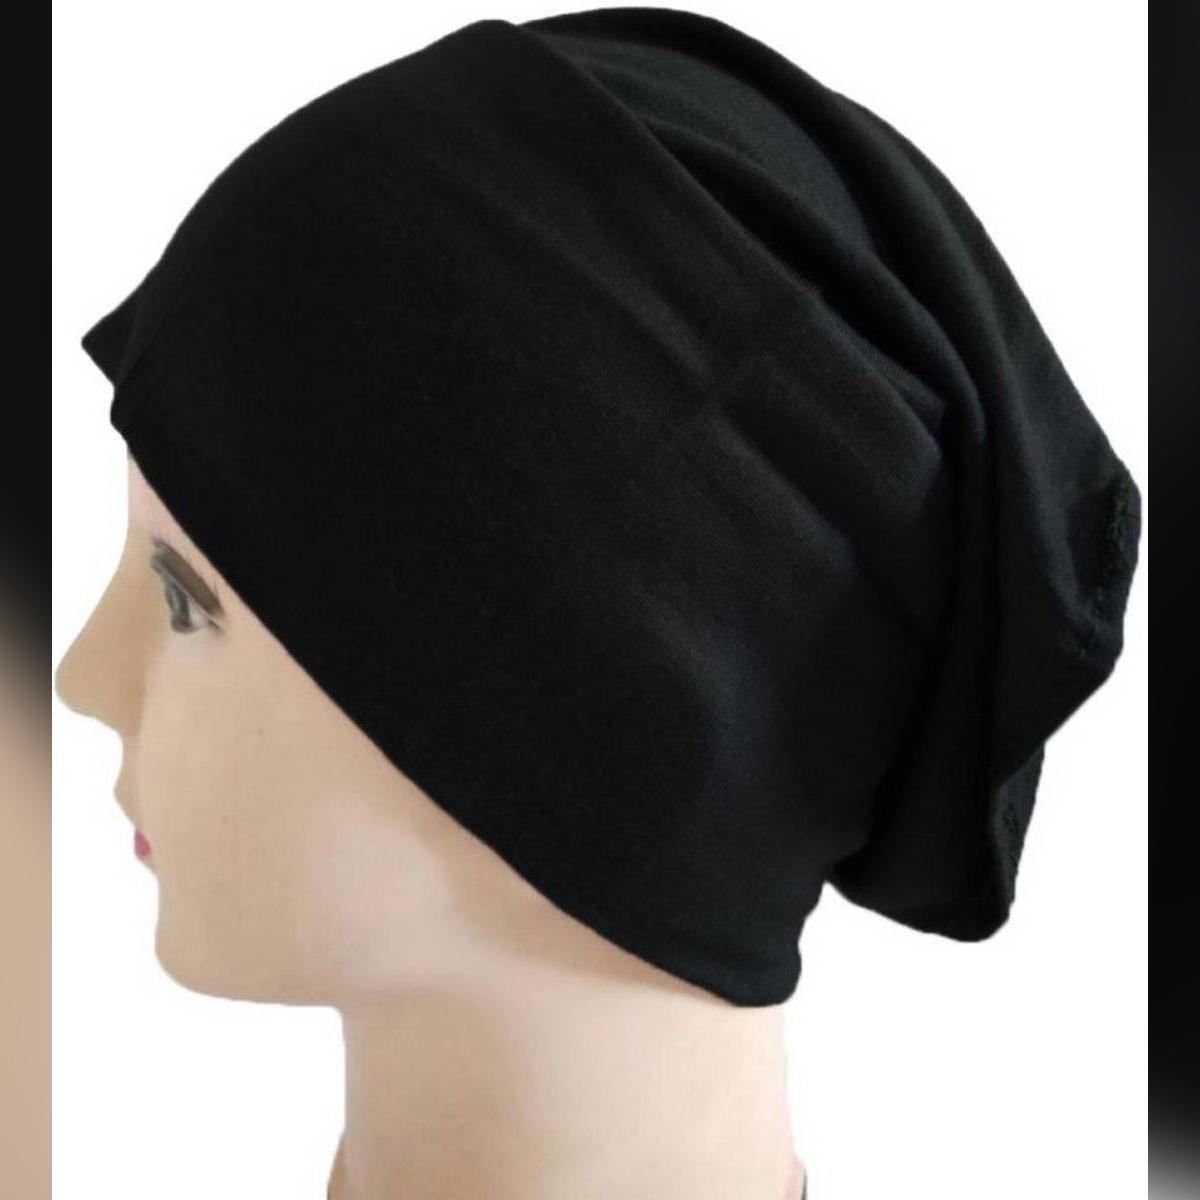 Plain Skin Muslim Headscarf Inner Hijab Caps Wraps Women Islamic Under Scarf Ninja Scarf Ramadan Stretch Cotton Bonnet Caps Full Cover Islamic Hat